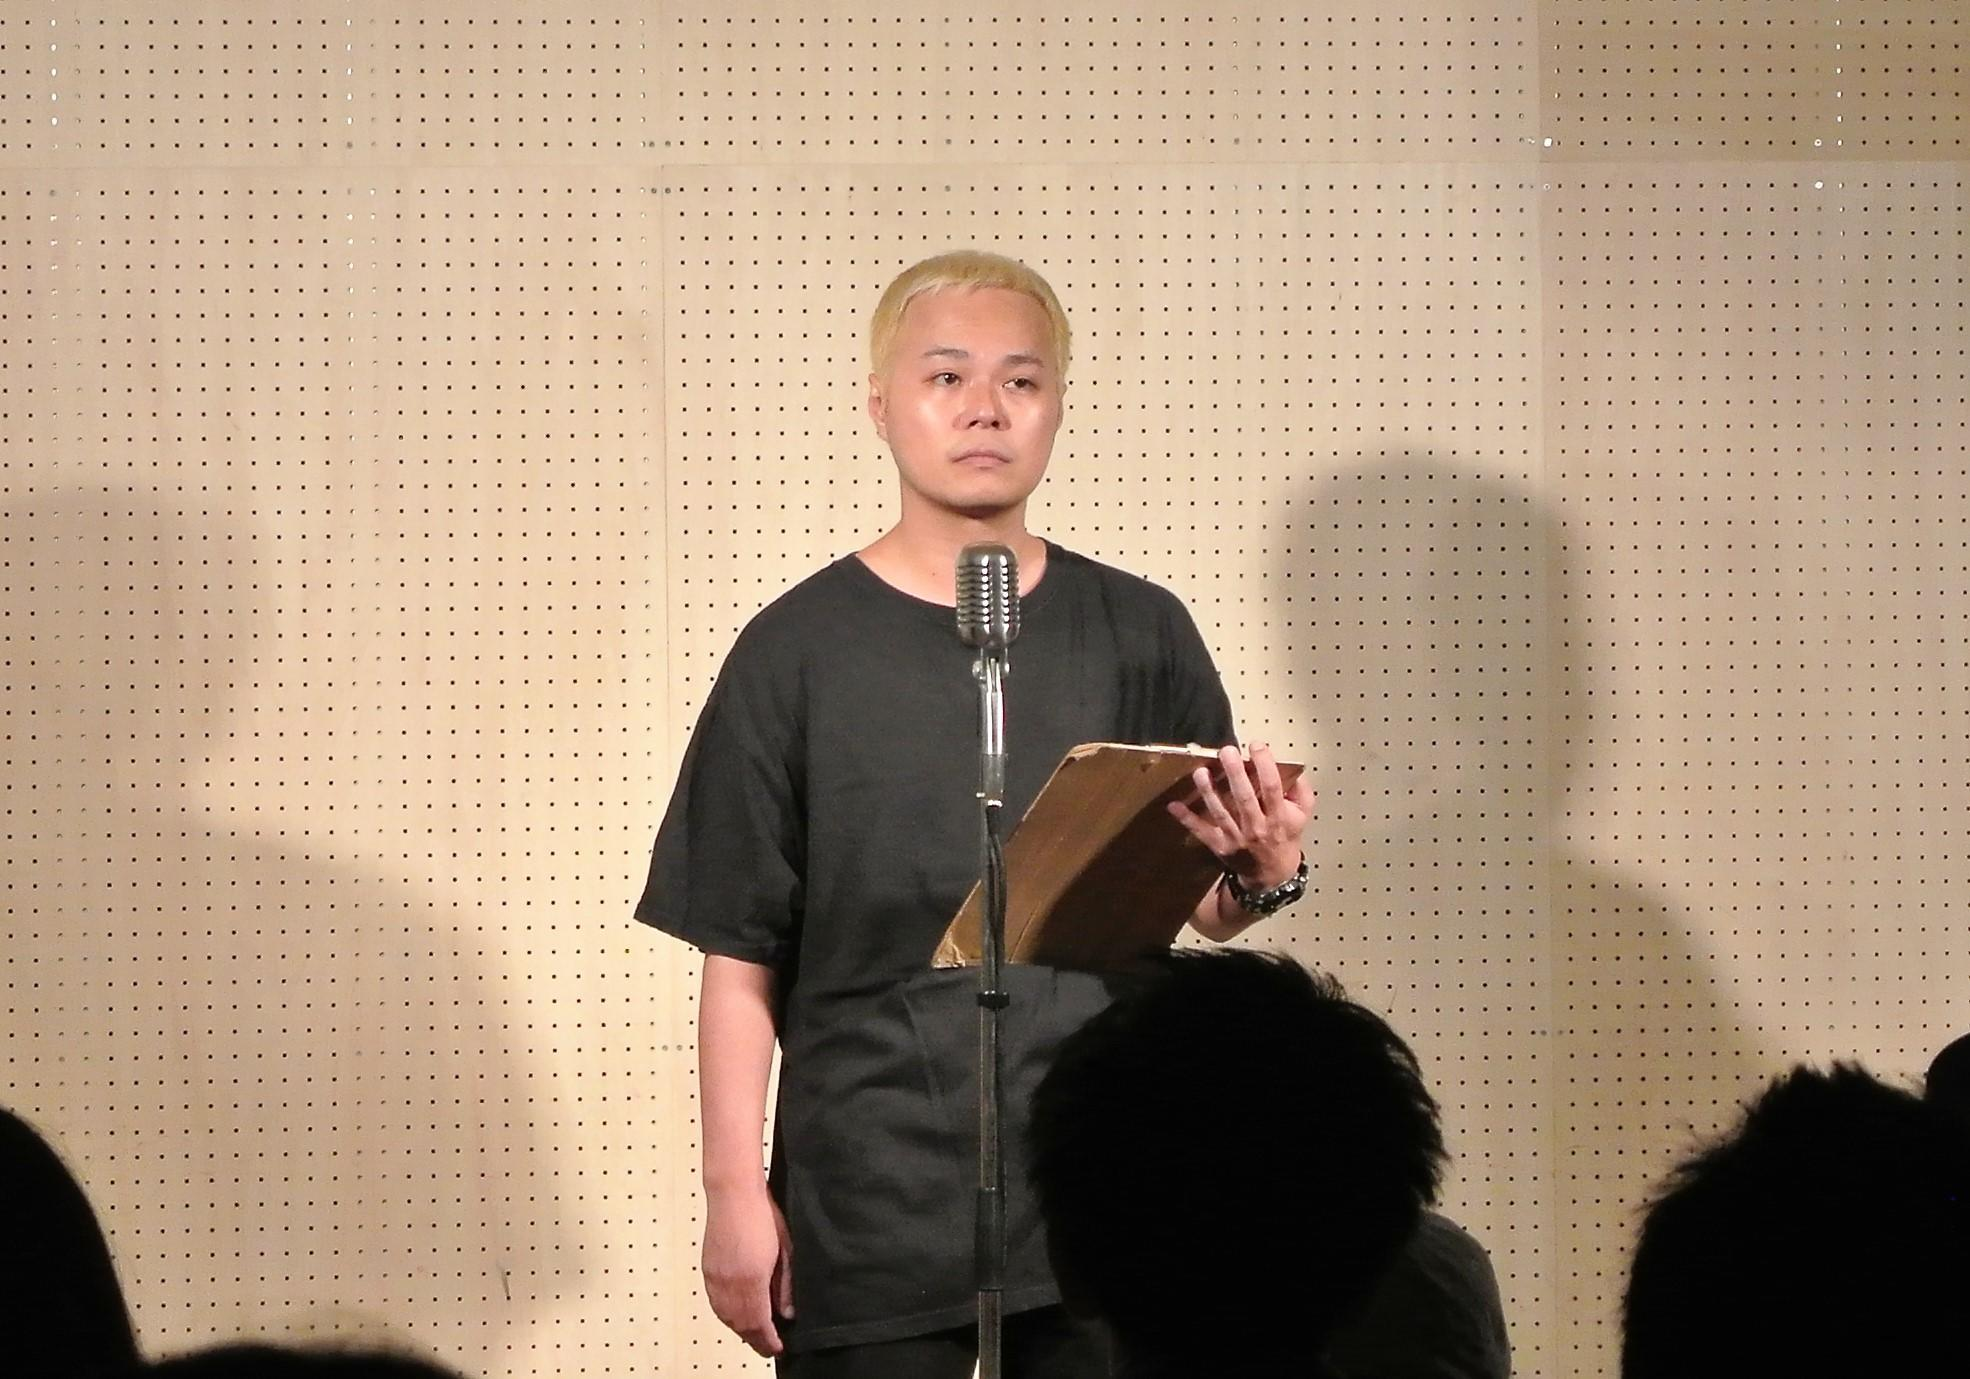 http://news.yoshimoto.co.jp/20171012190537-0758ba00874c83c67fa90740871ecc2cfdd4504d.jpg